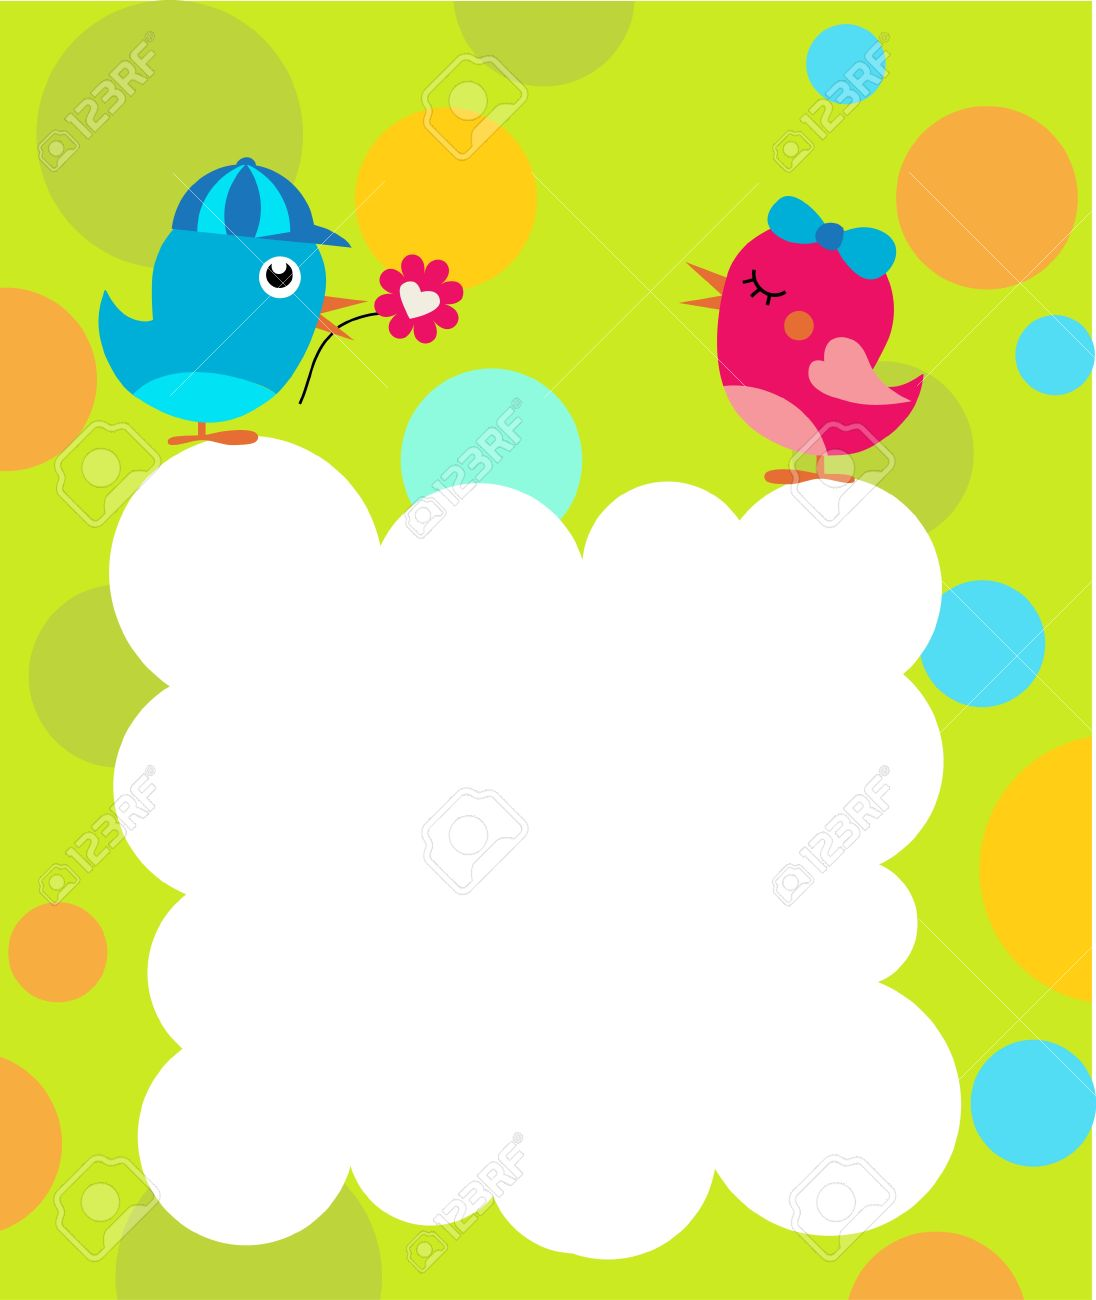 greetings card template